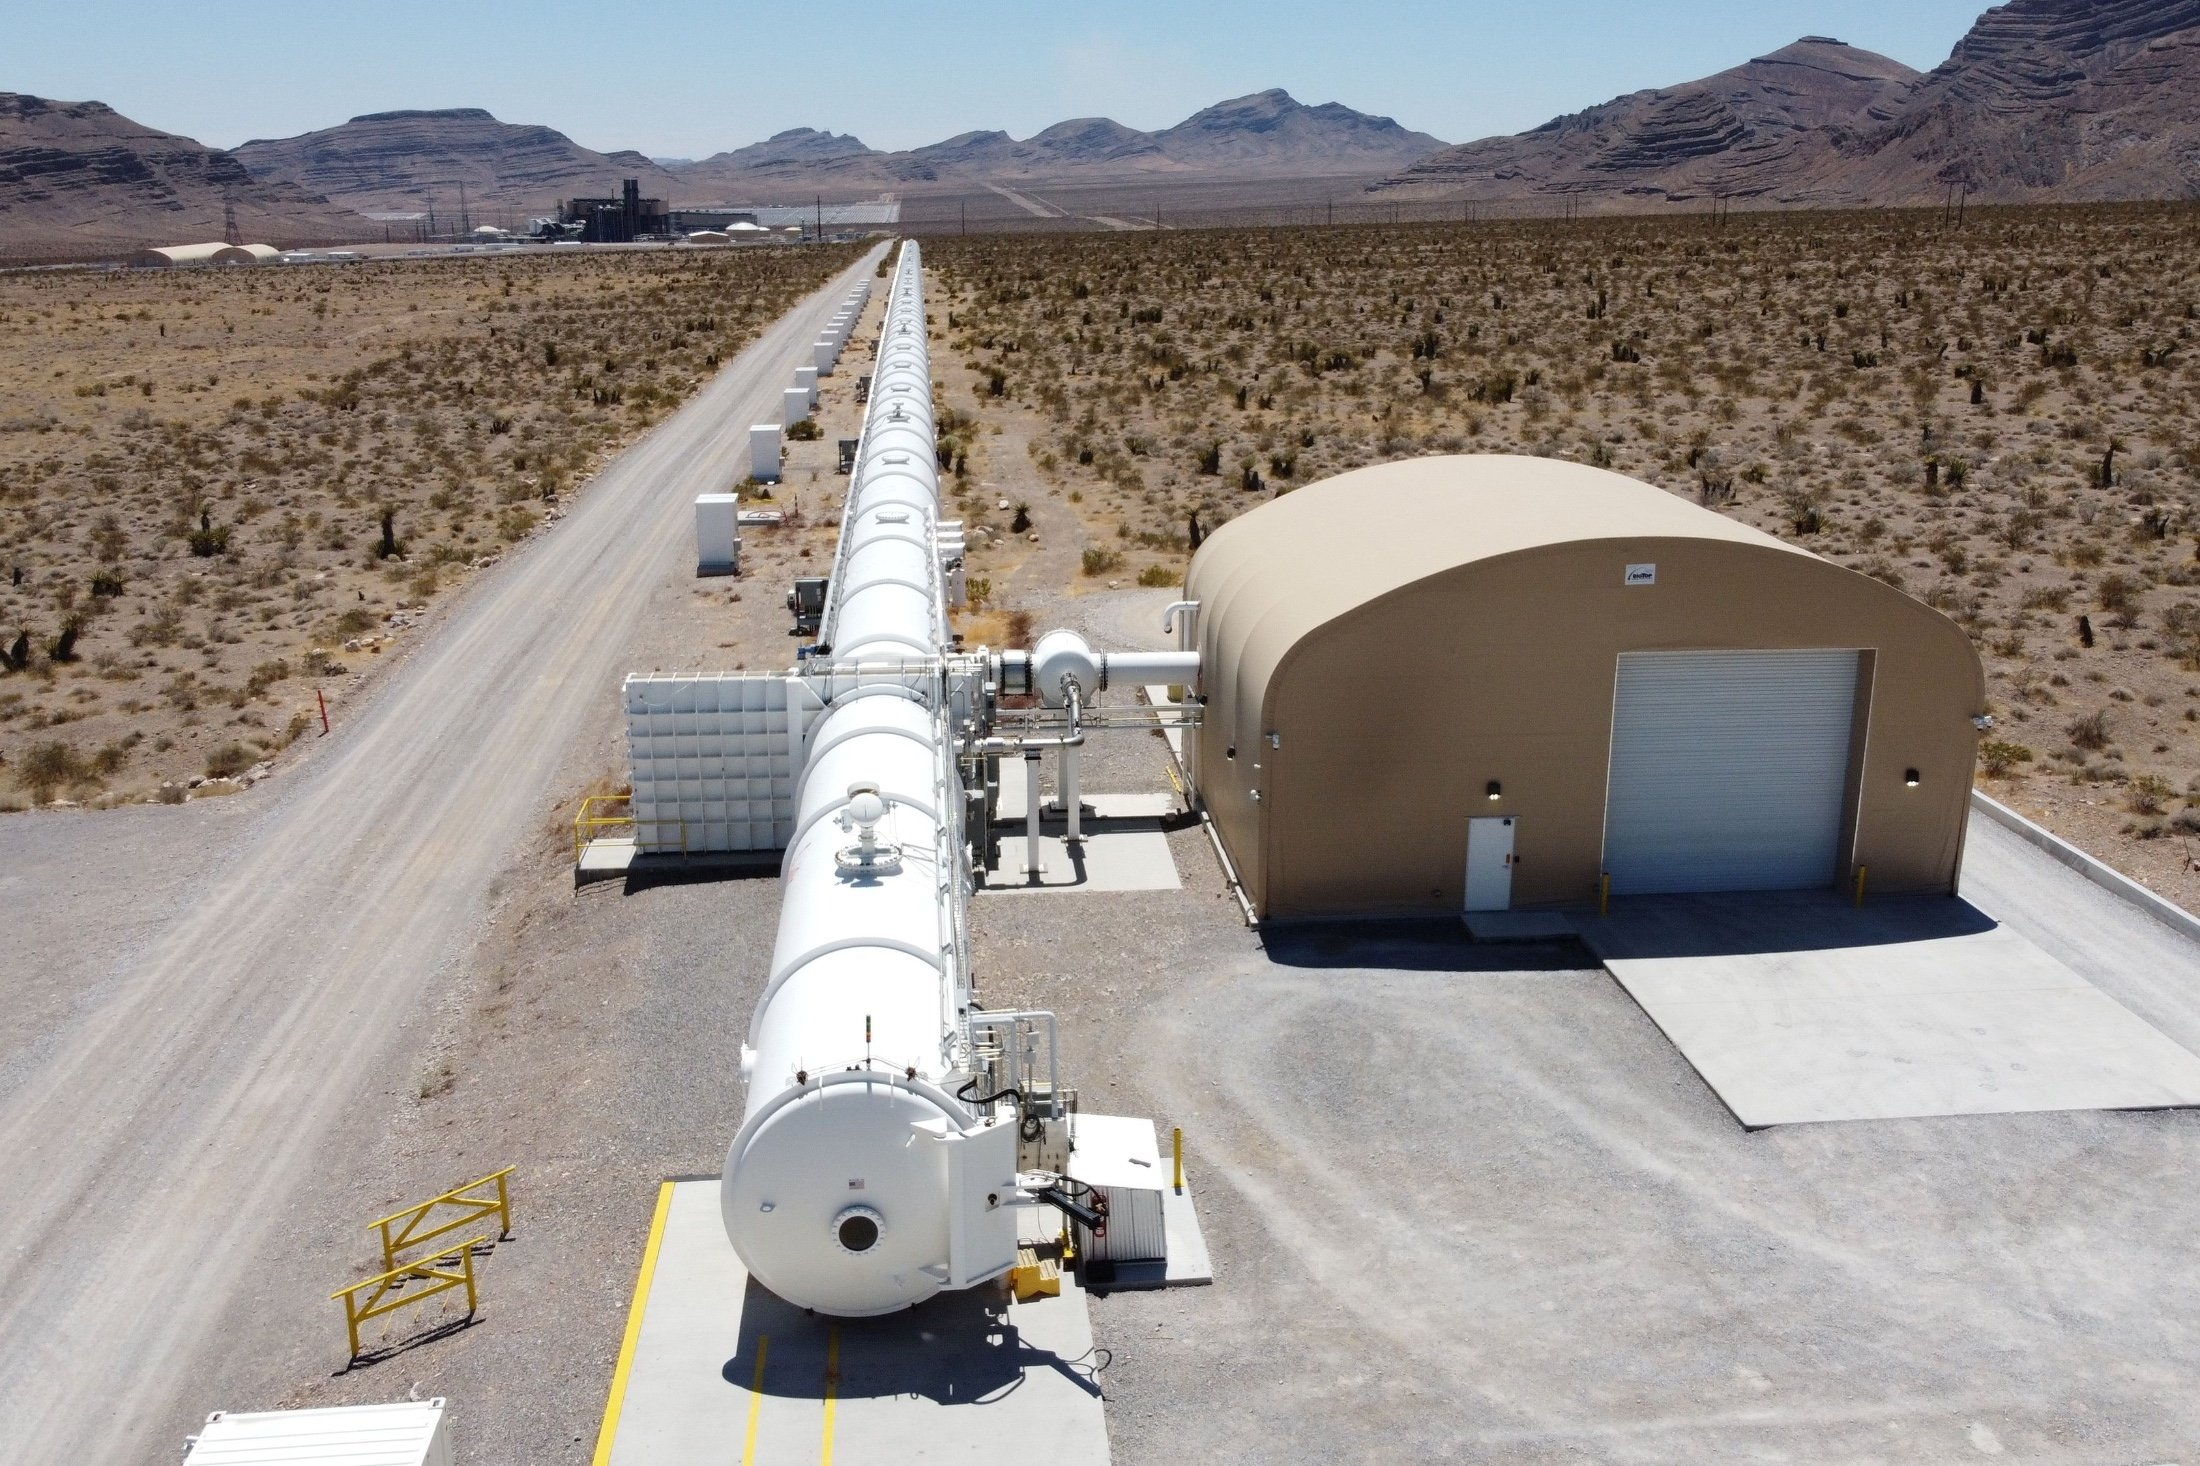 A test hyperloop tube is seen at the Virgin Hyperloop facility near Las Vegas, Nevada, U.S., May 5, 2021. (Reuters Photo)